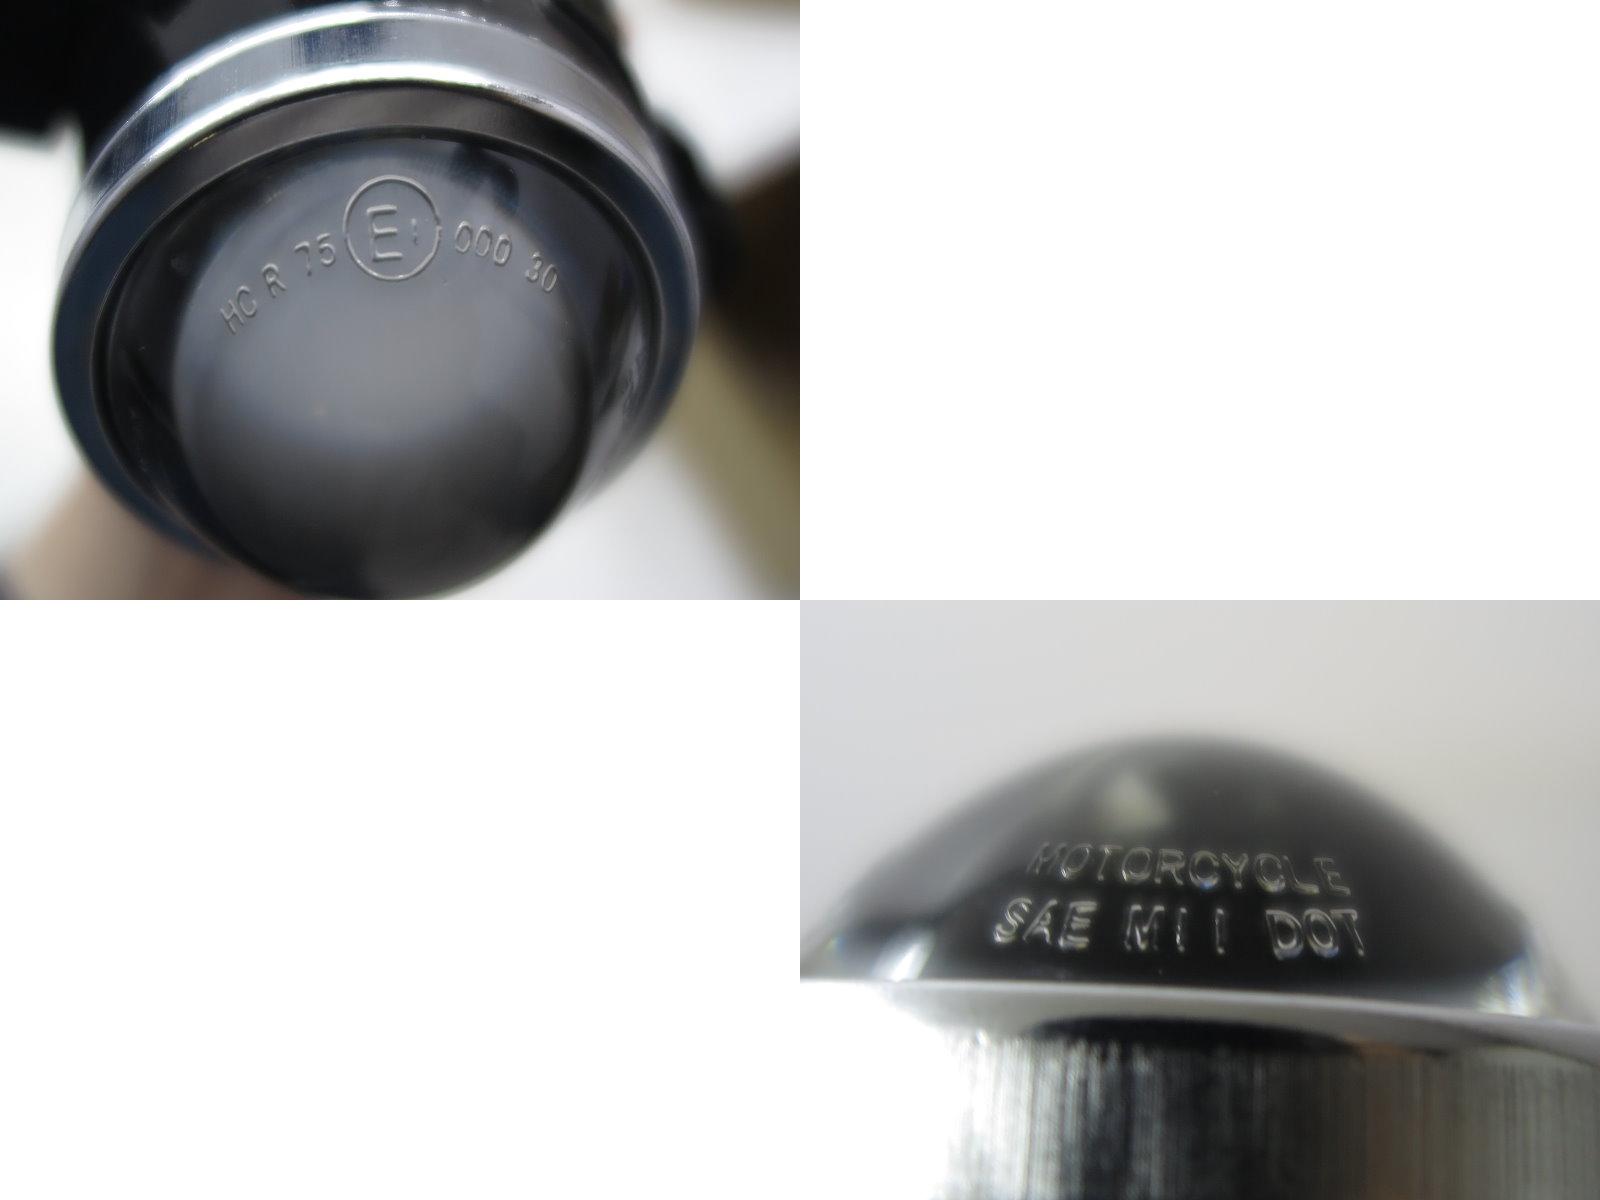 thumbnail 6 - CX-7 2007-2010 SUV 5D Projector Dual Beam Fog Light Black for MAZDA